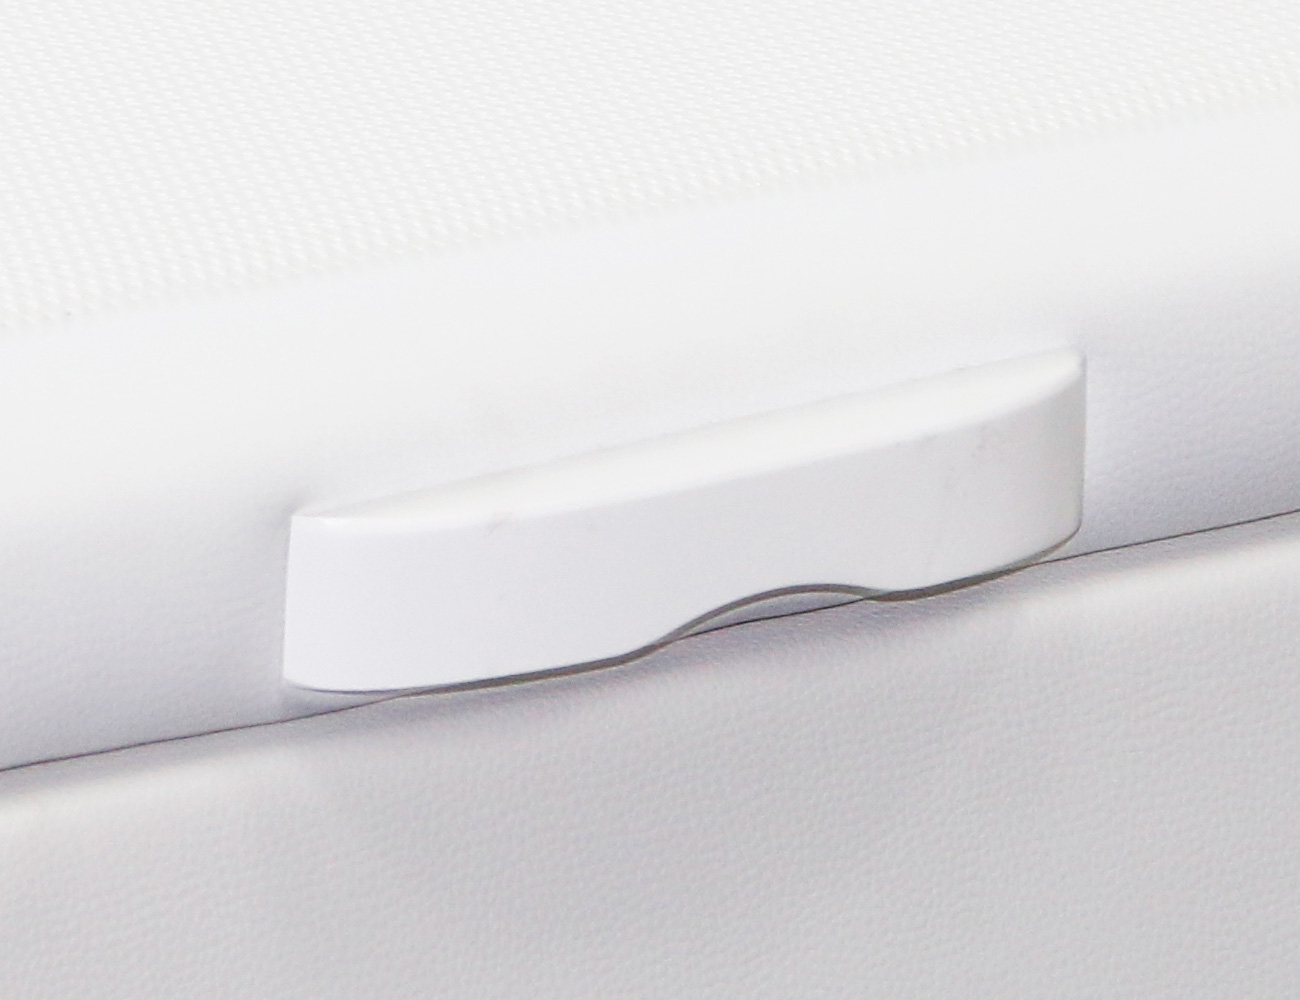 Canape polipiel blanco hercules detalle